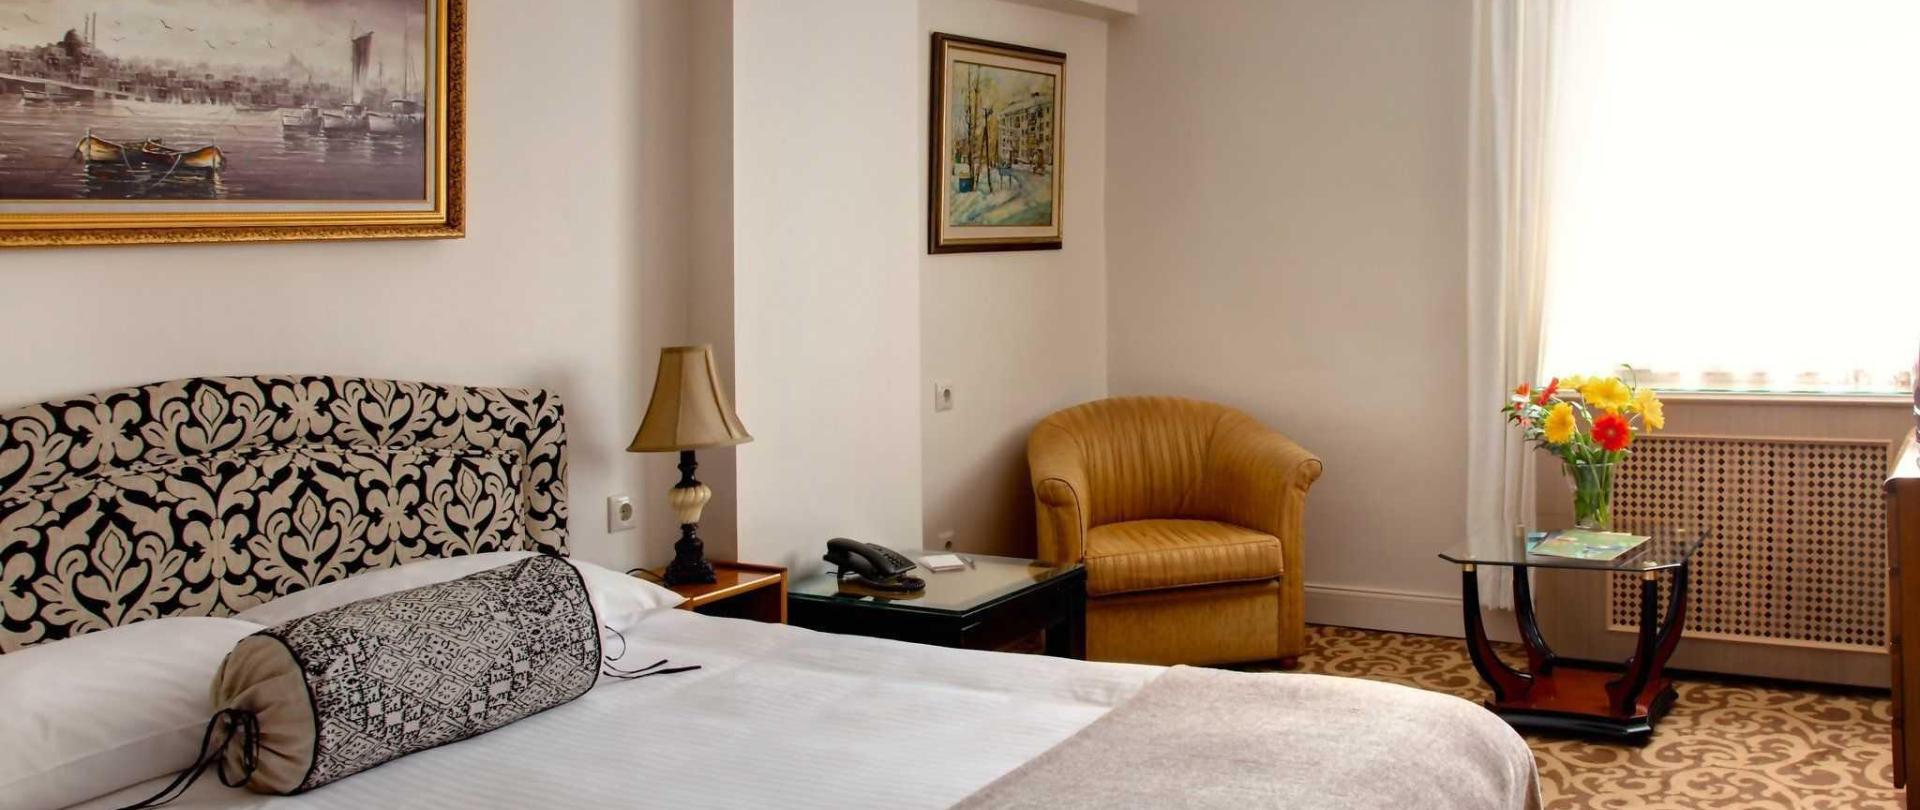 double-room-1-1.jpg